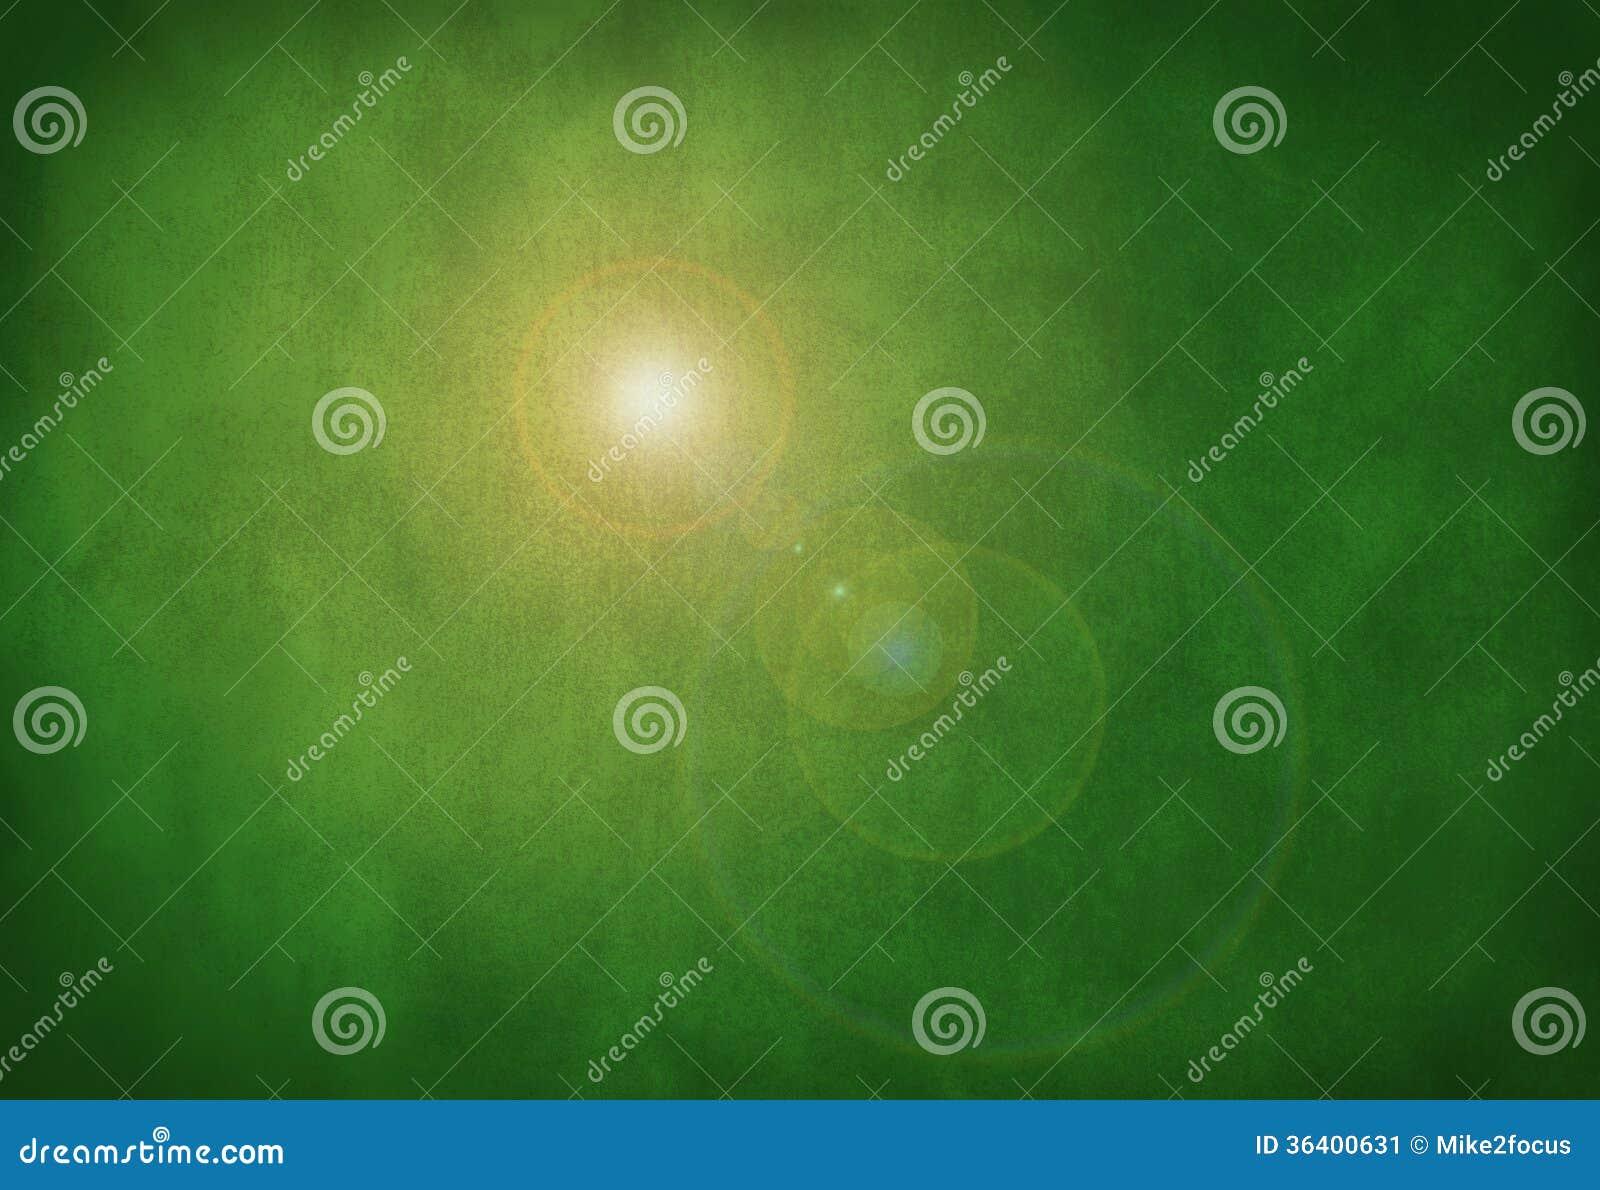 earthy green background - photo #40